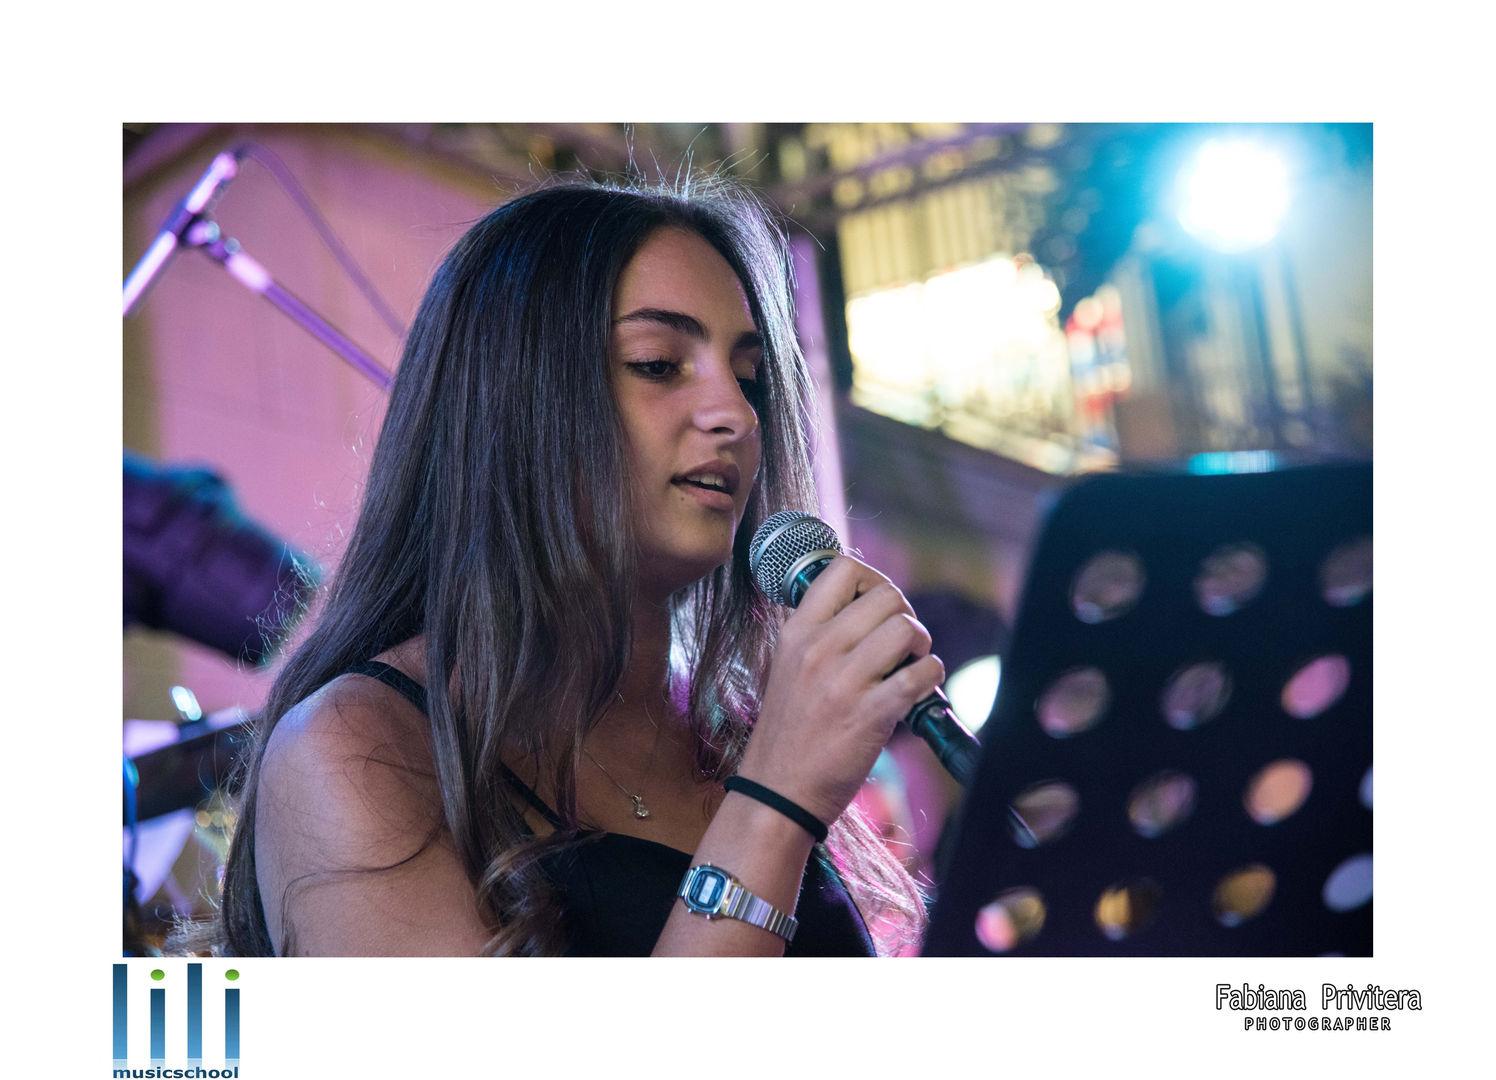 Bimbi lili 2018 Fabiana Privitera Photographer (90).jpg